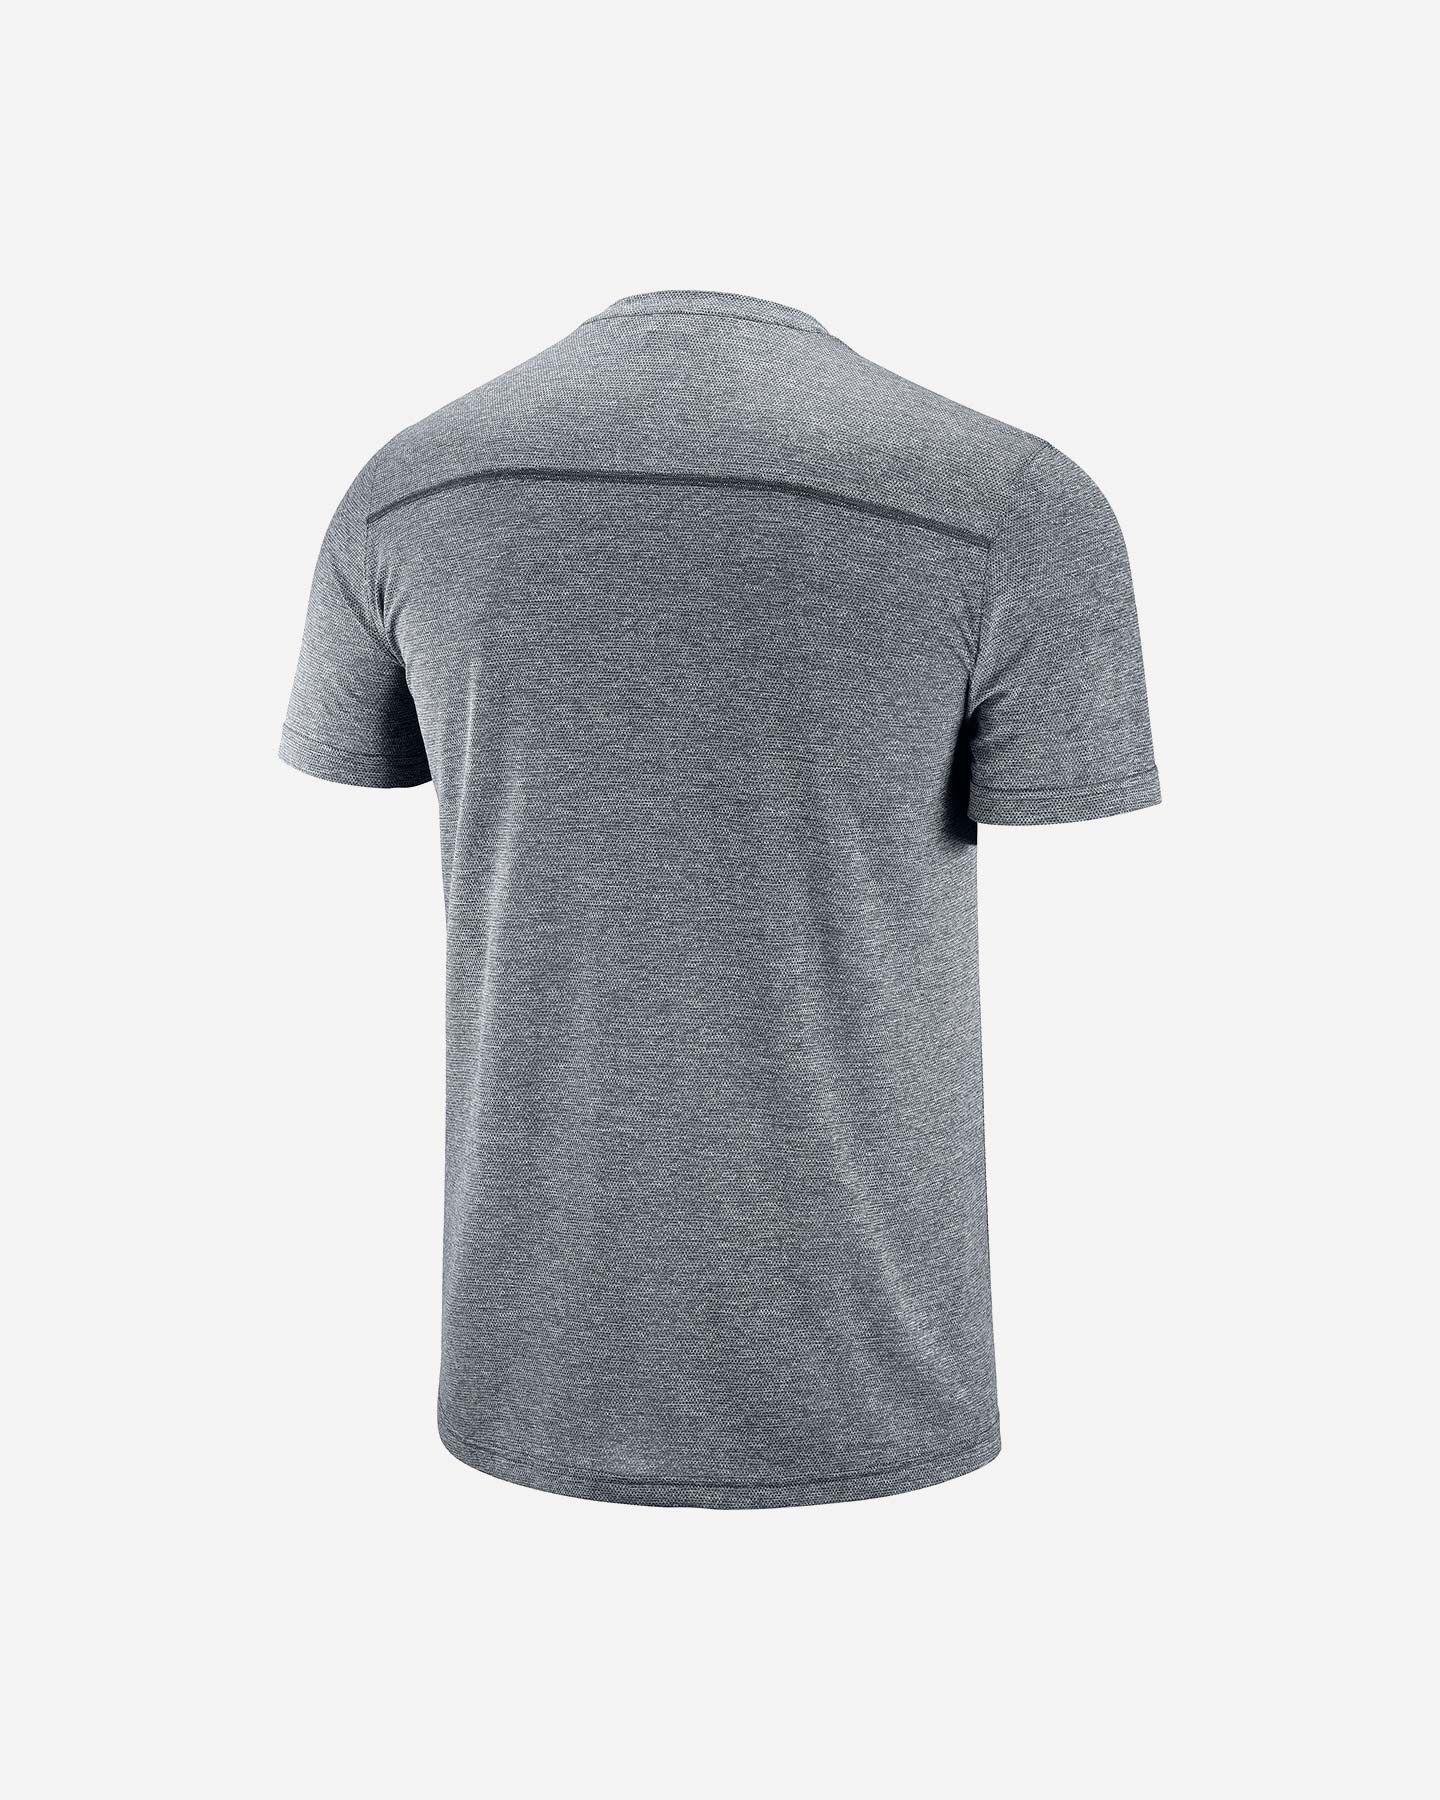 T-Shirt SALOMON EXPLORE PIQUE M S5173794 scatto 1